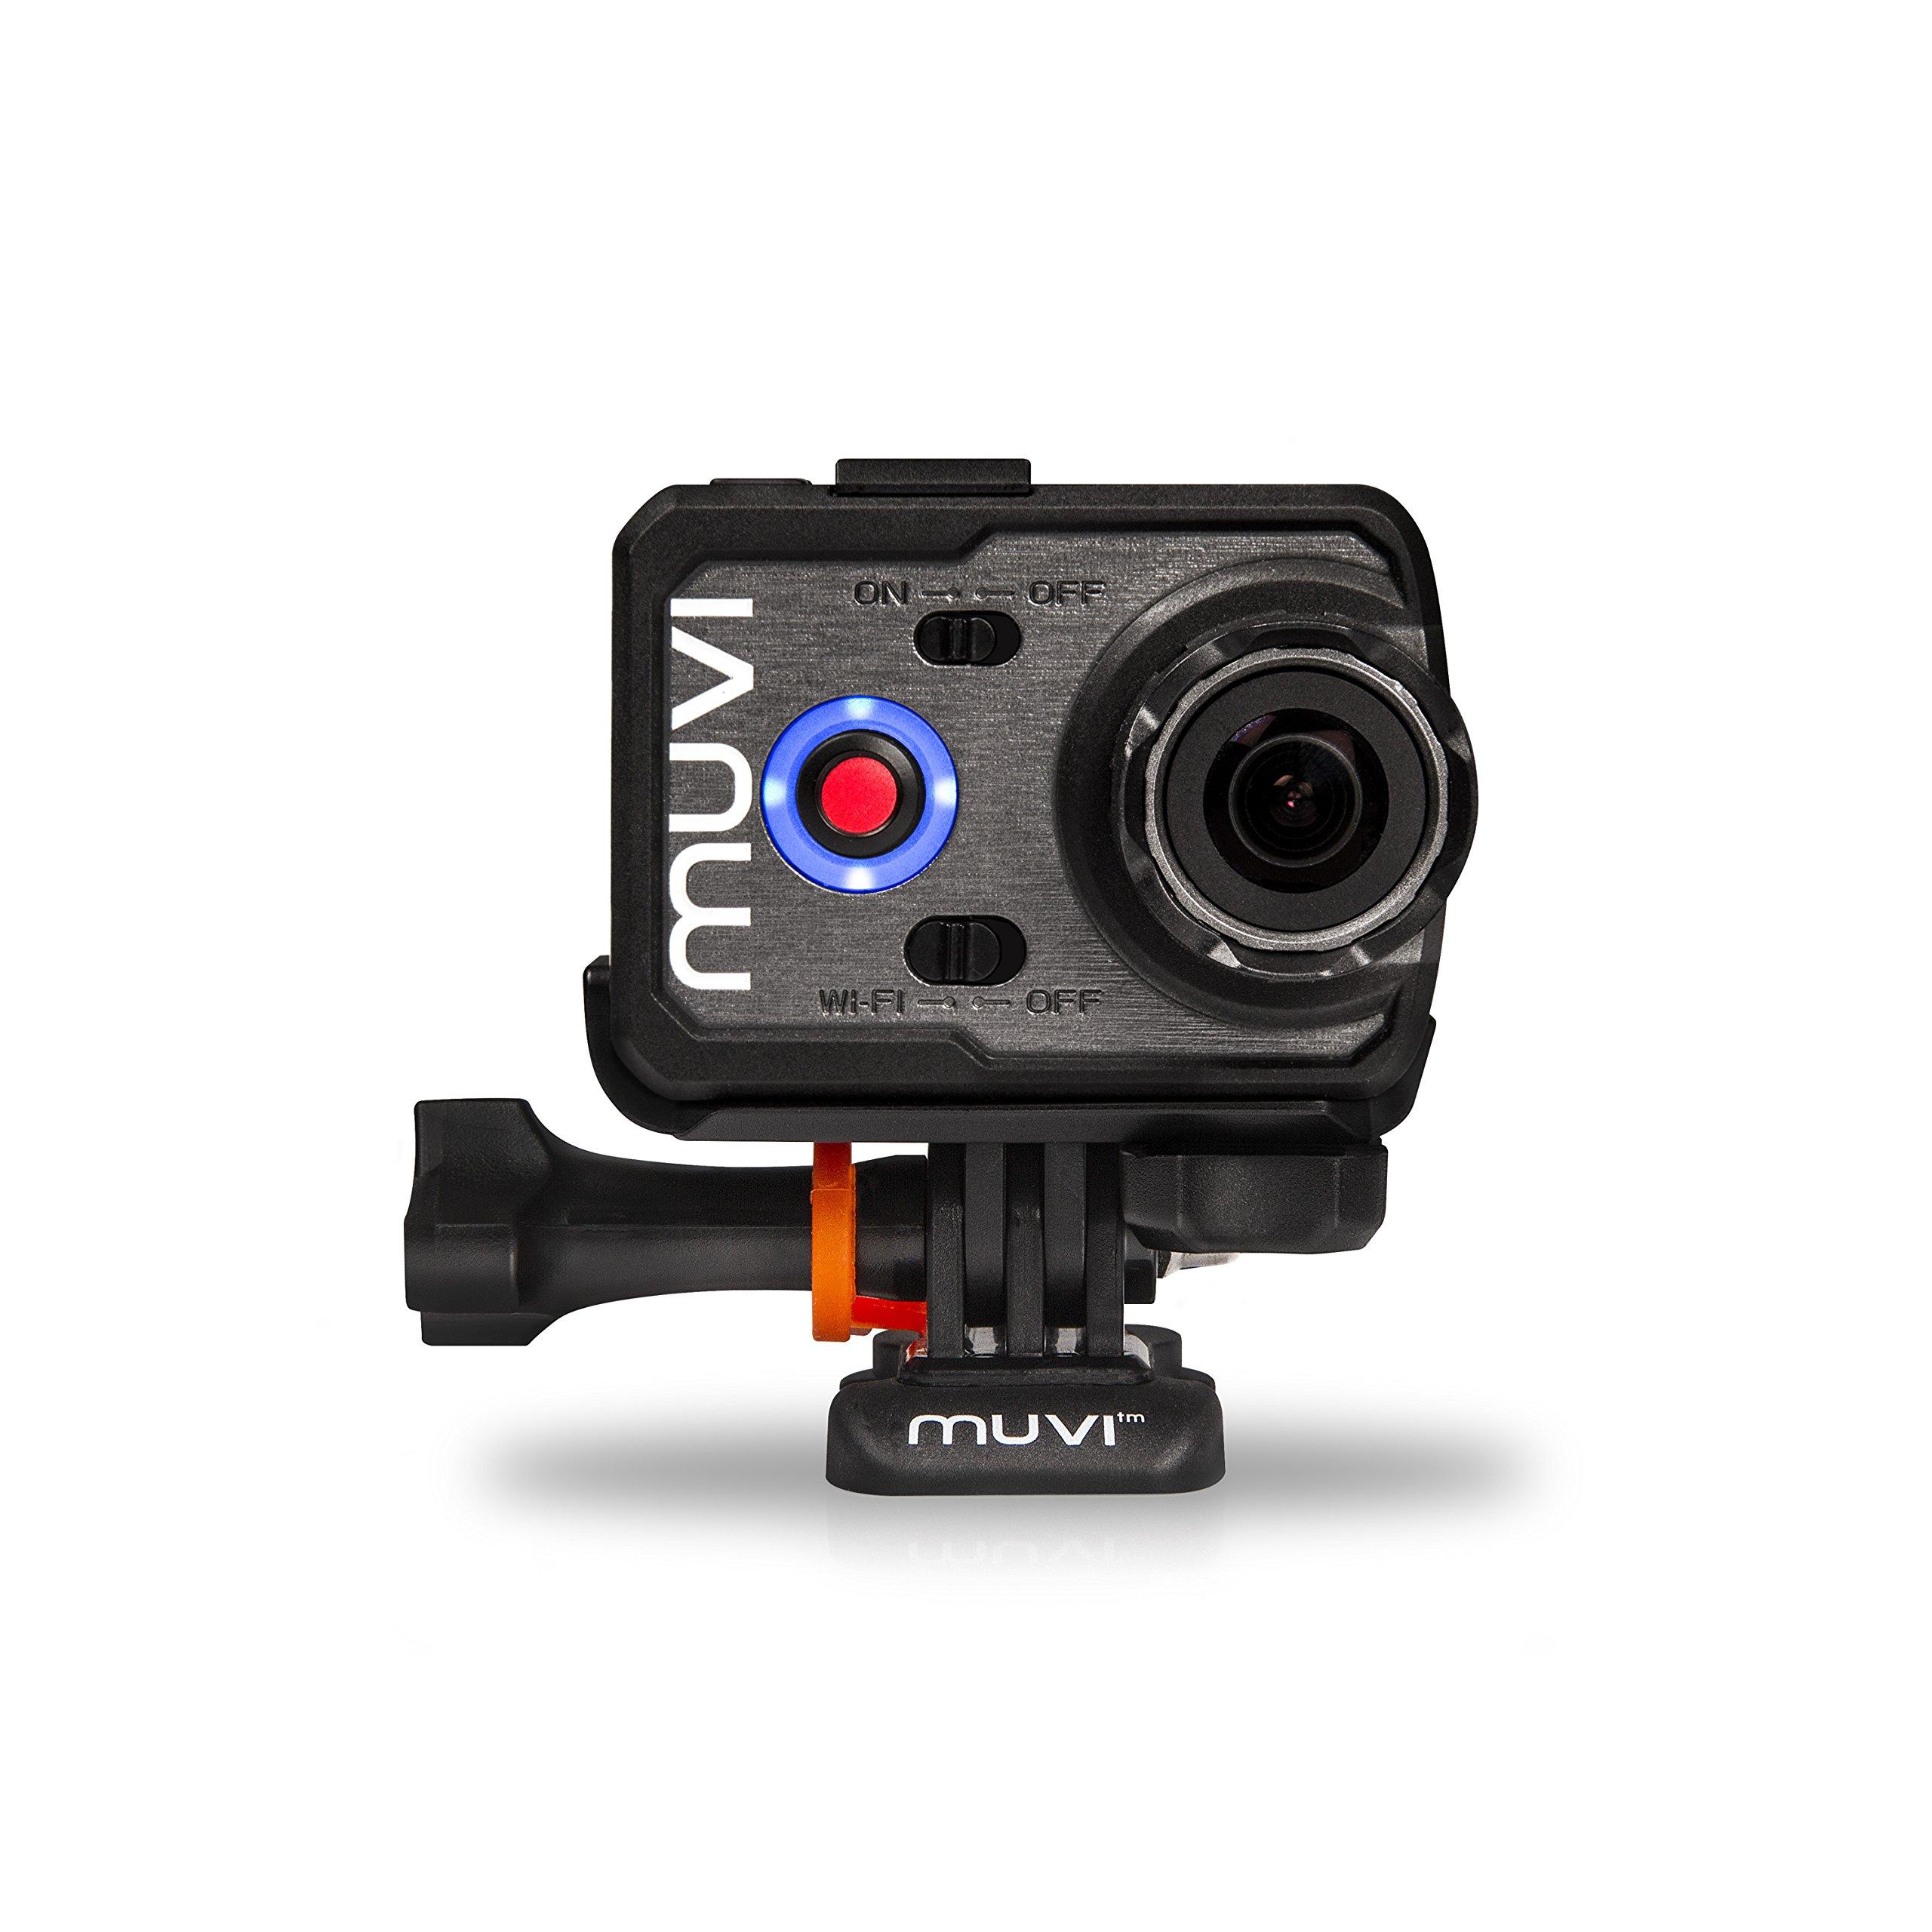 Compatible with Veho MUVI HD DURAGADGET Quality Action Camera Helmet Mount VCC-004-ATOM-NPNG Super Micro /& VCC-005-MUVI-NPNG MUVI HD Mini VCC-005-MUVI-HDNPNG Mini